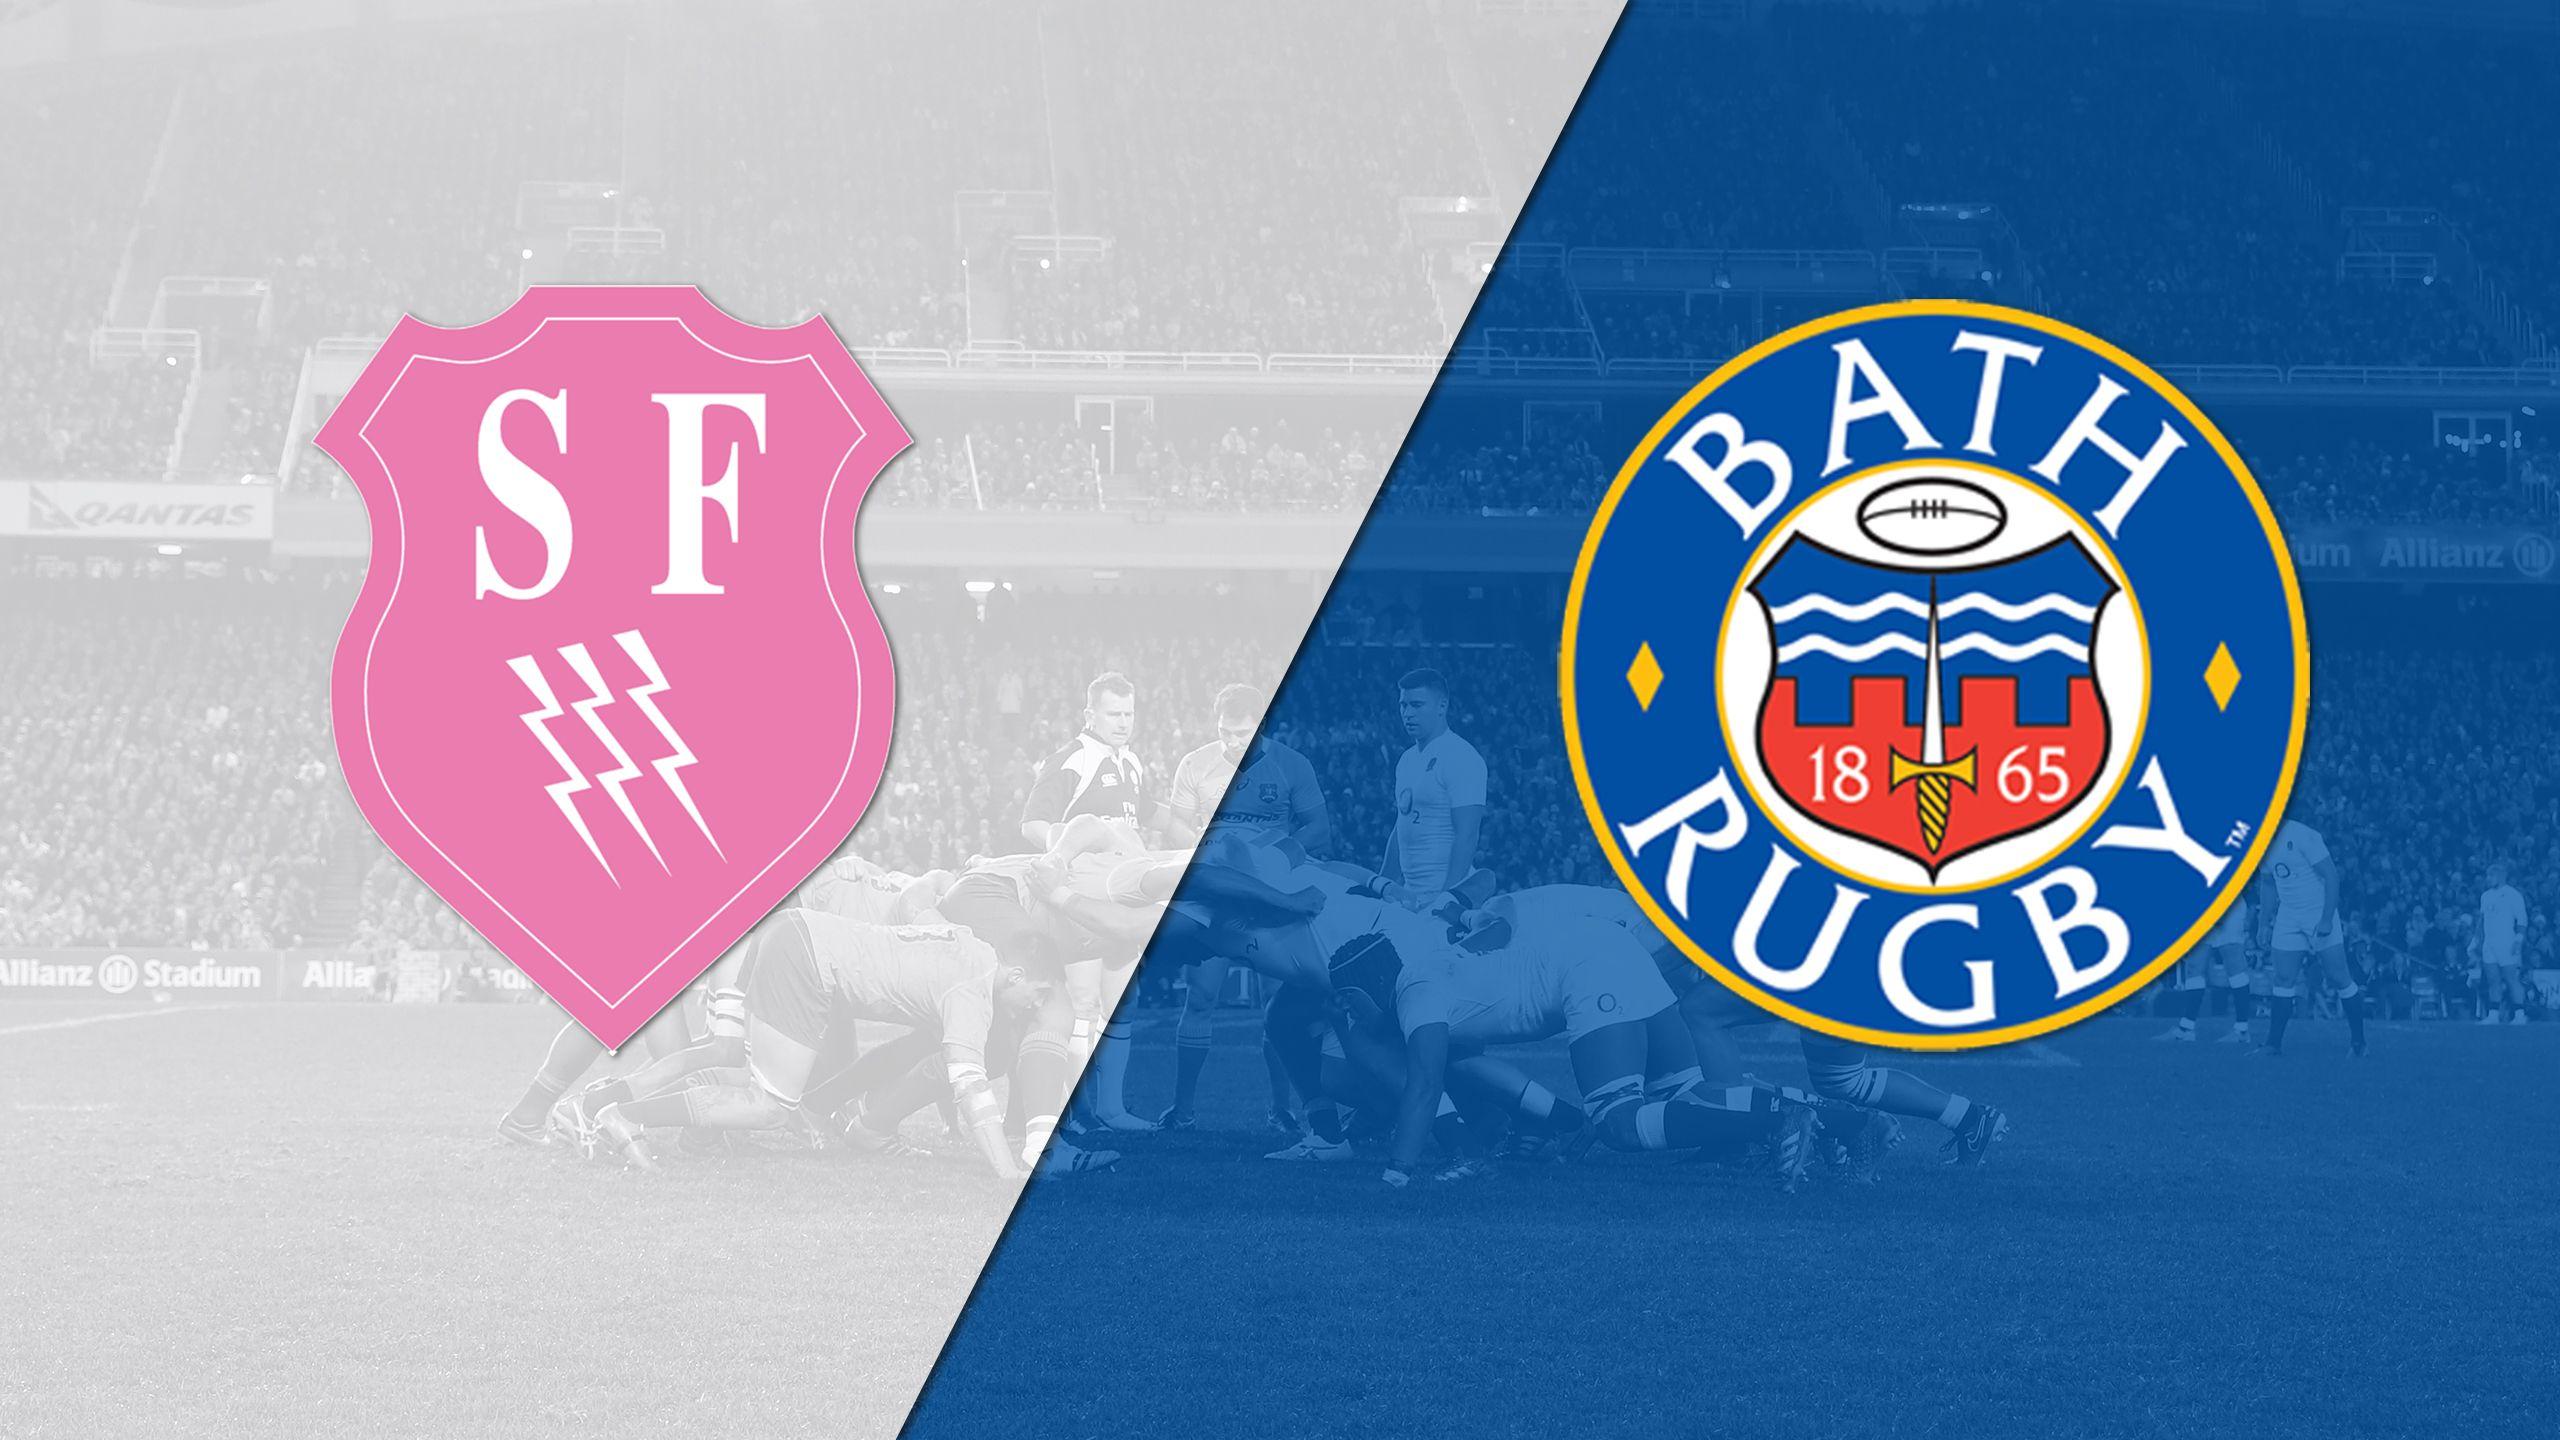 Stade Francais vs. Bath (Semifinals) (European Challenge Cup)